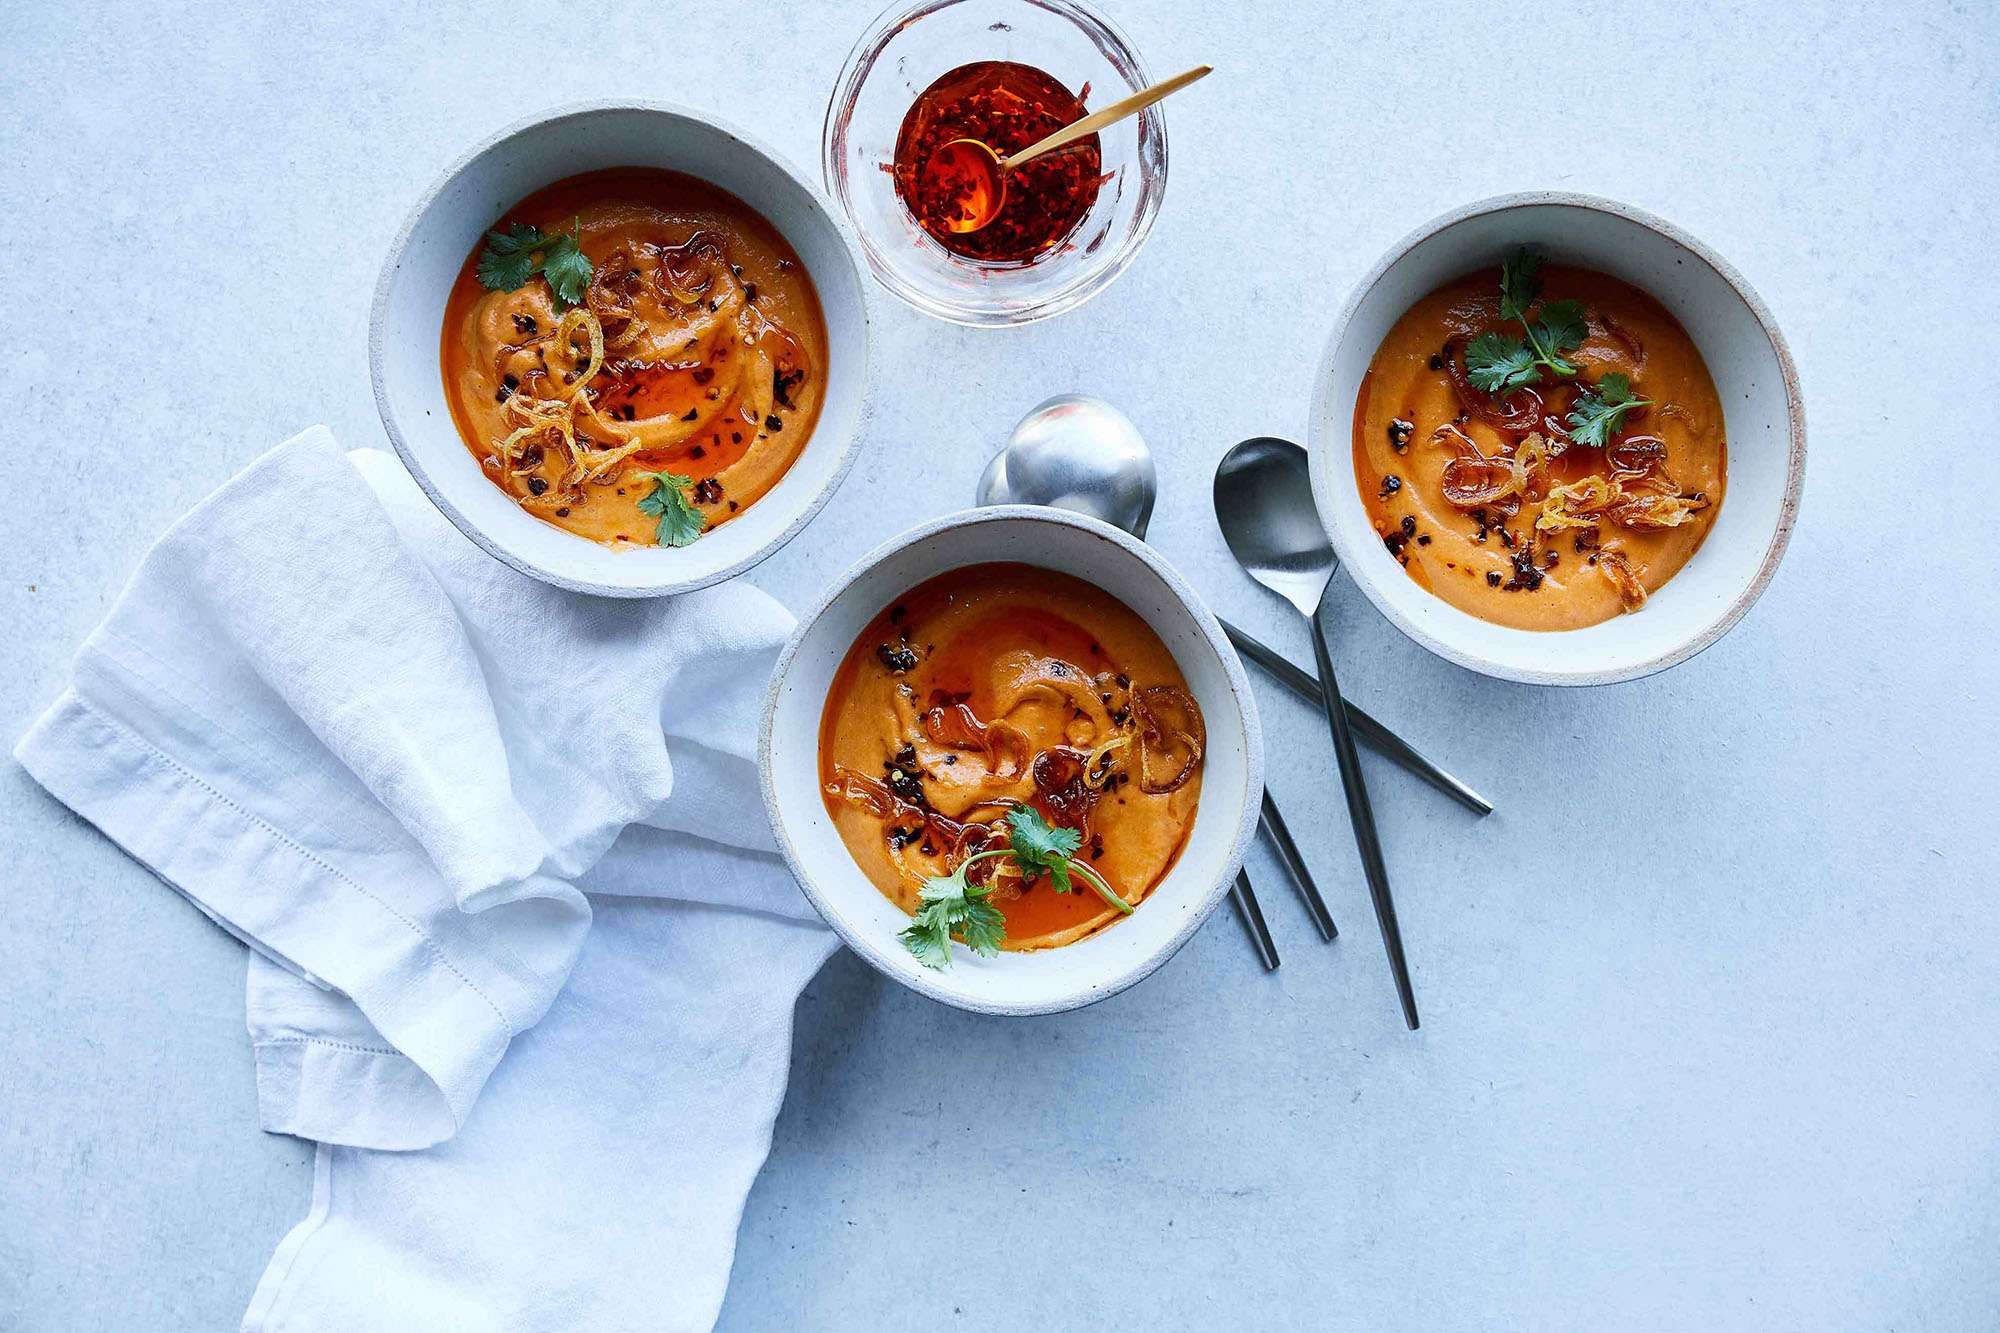 Cravings-2-Carrot-Soup-1834.jpg